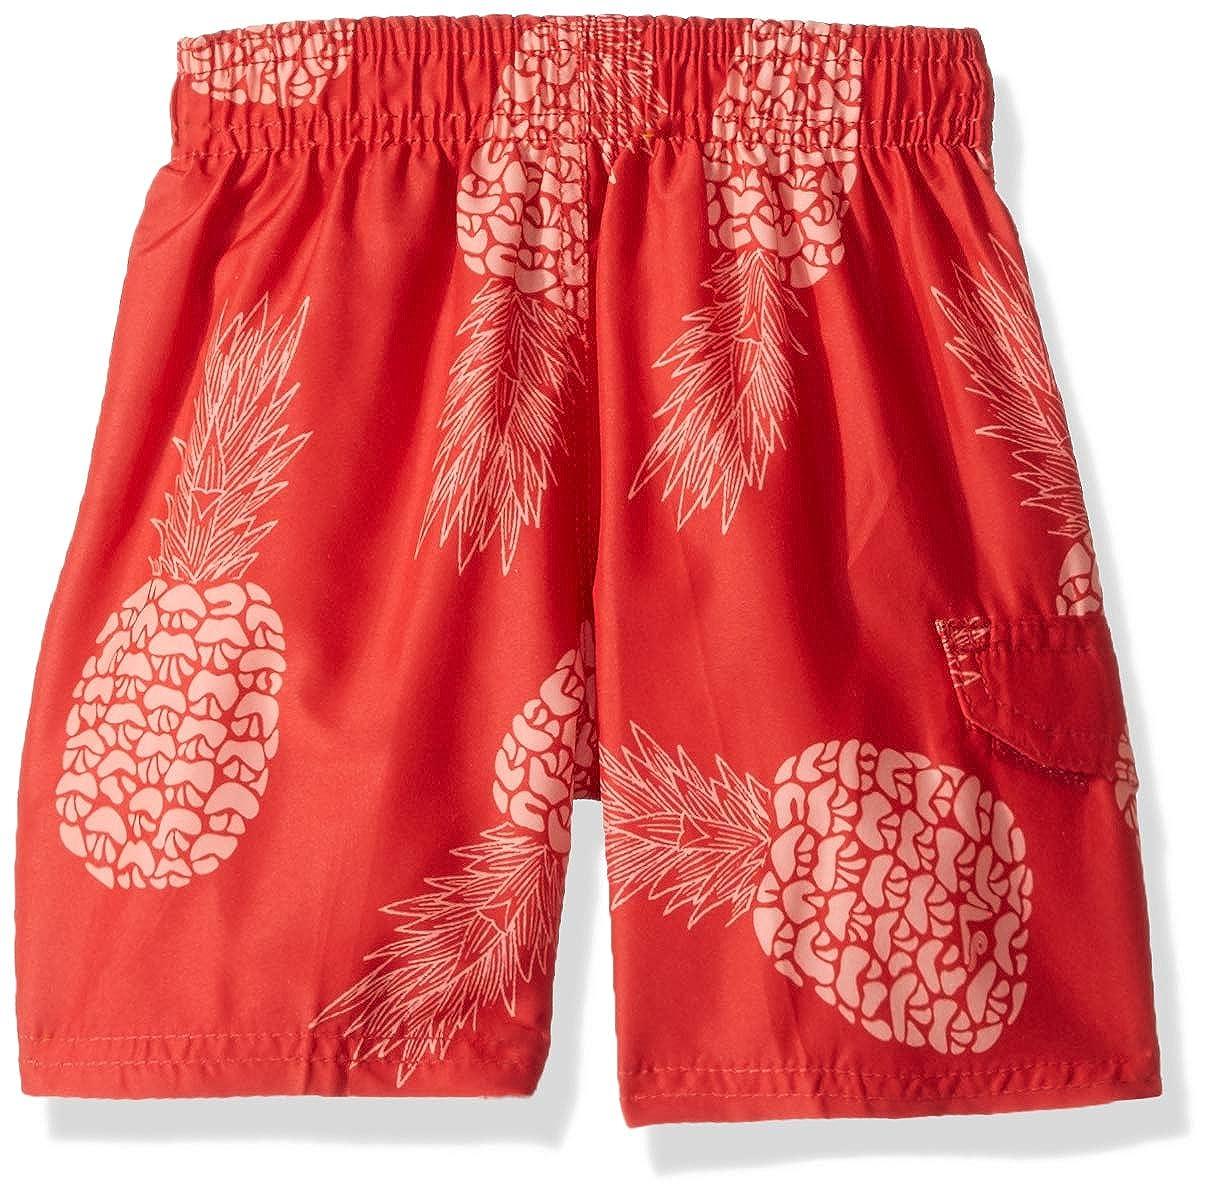 f14667b0c3 14/16 6430 Red Kanu Surf Boys Big Pina Pineapple Quick Dry Beach Board  Shorts Swim Trunk Large